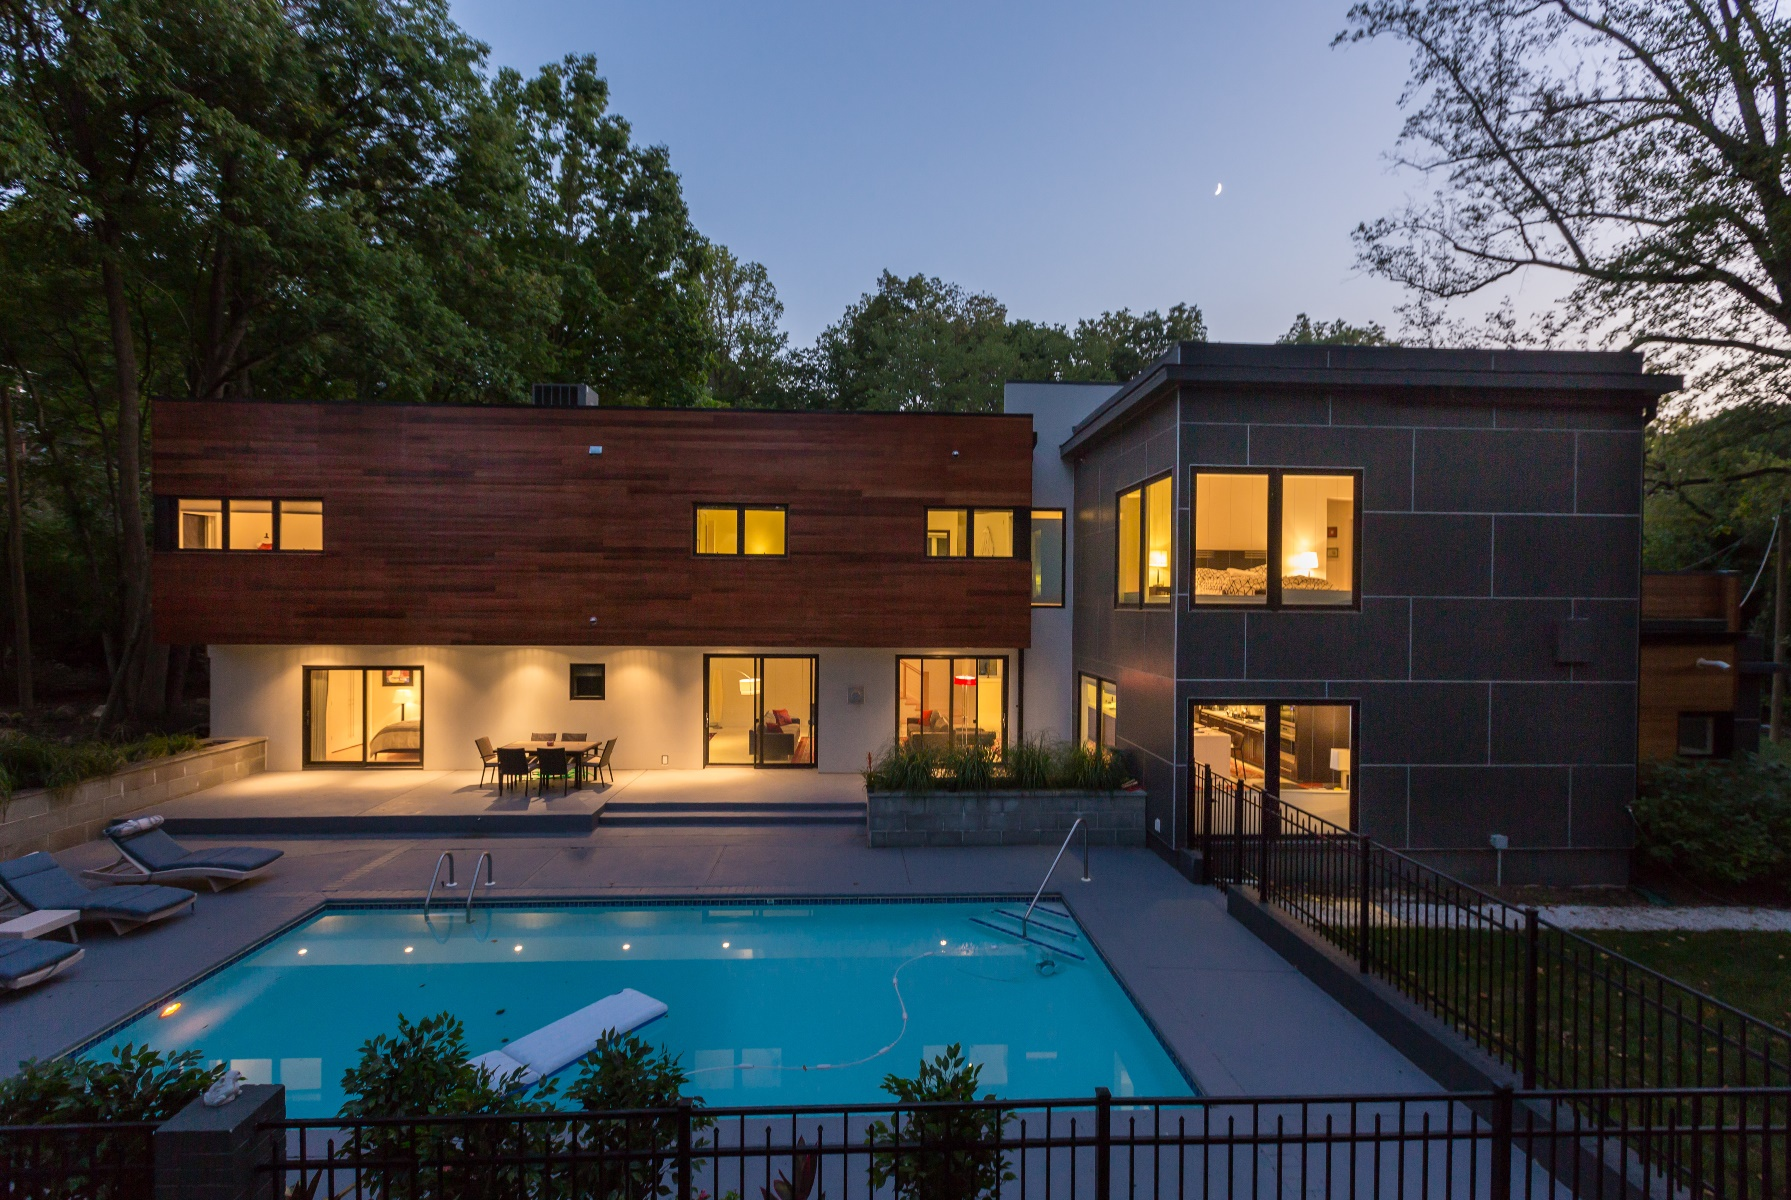 Additional photo for property listing at 6309 Bradley Boulevard, Bethesda 6309 Bradley Blvd Bethesda, Maryland 20817 Estados Unidos